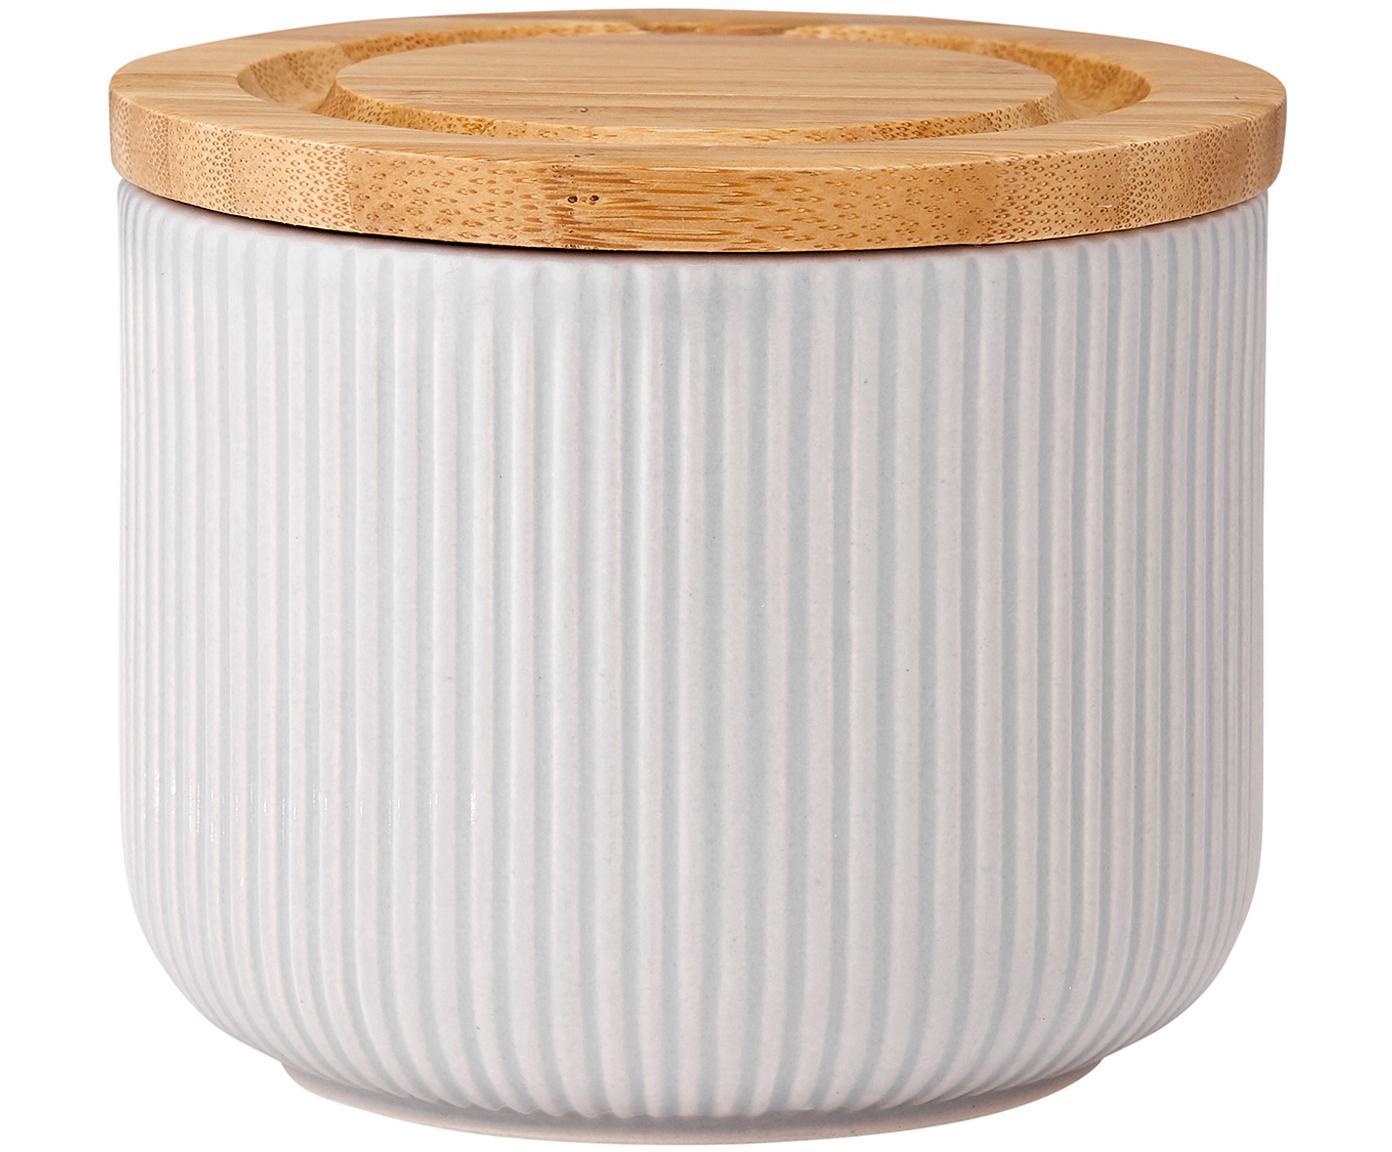 Aufbewahrungsdose Stak Groove mit Rillenstruktur, Dose: Keramik, Deckel: Bambusholz, Silikon, Grau, Ø 10 x H 9 cm